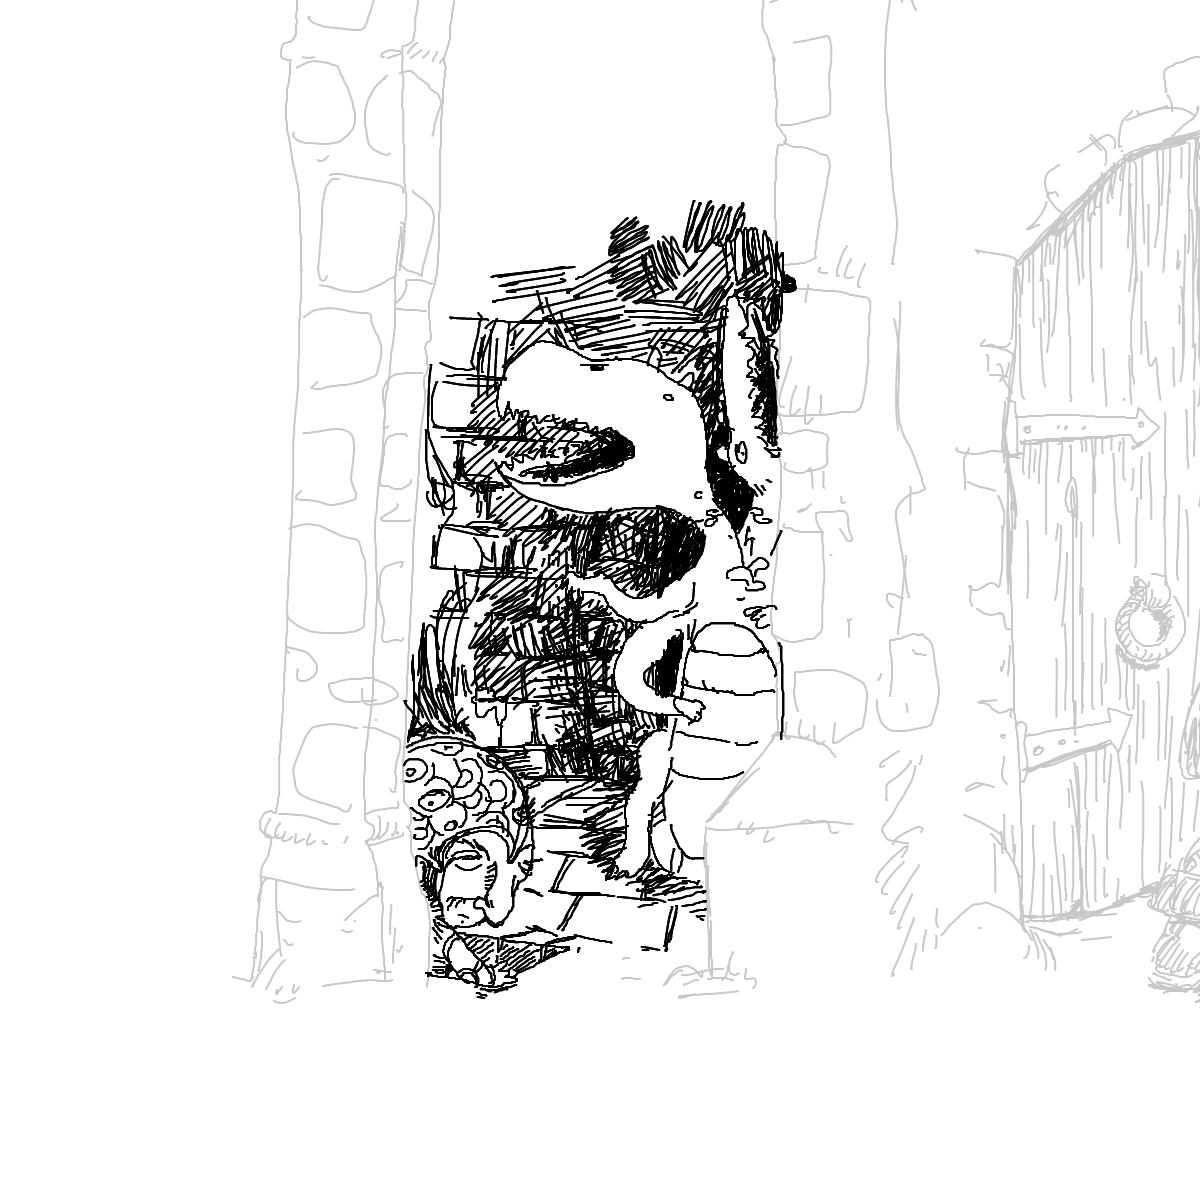 BAAAM drawing#6265 lat:78.4207305908203100lng: -4.4898915290832520